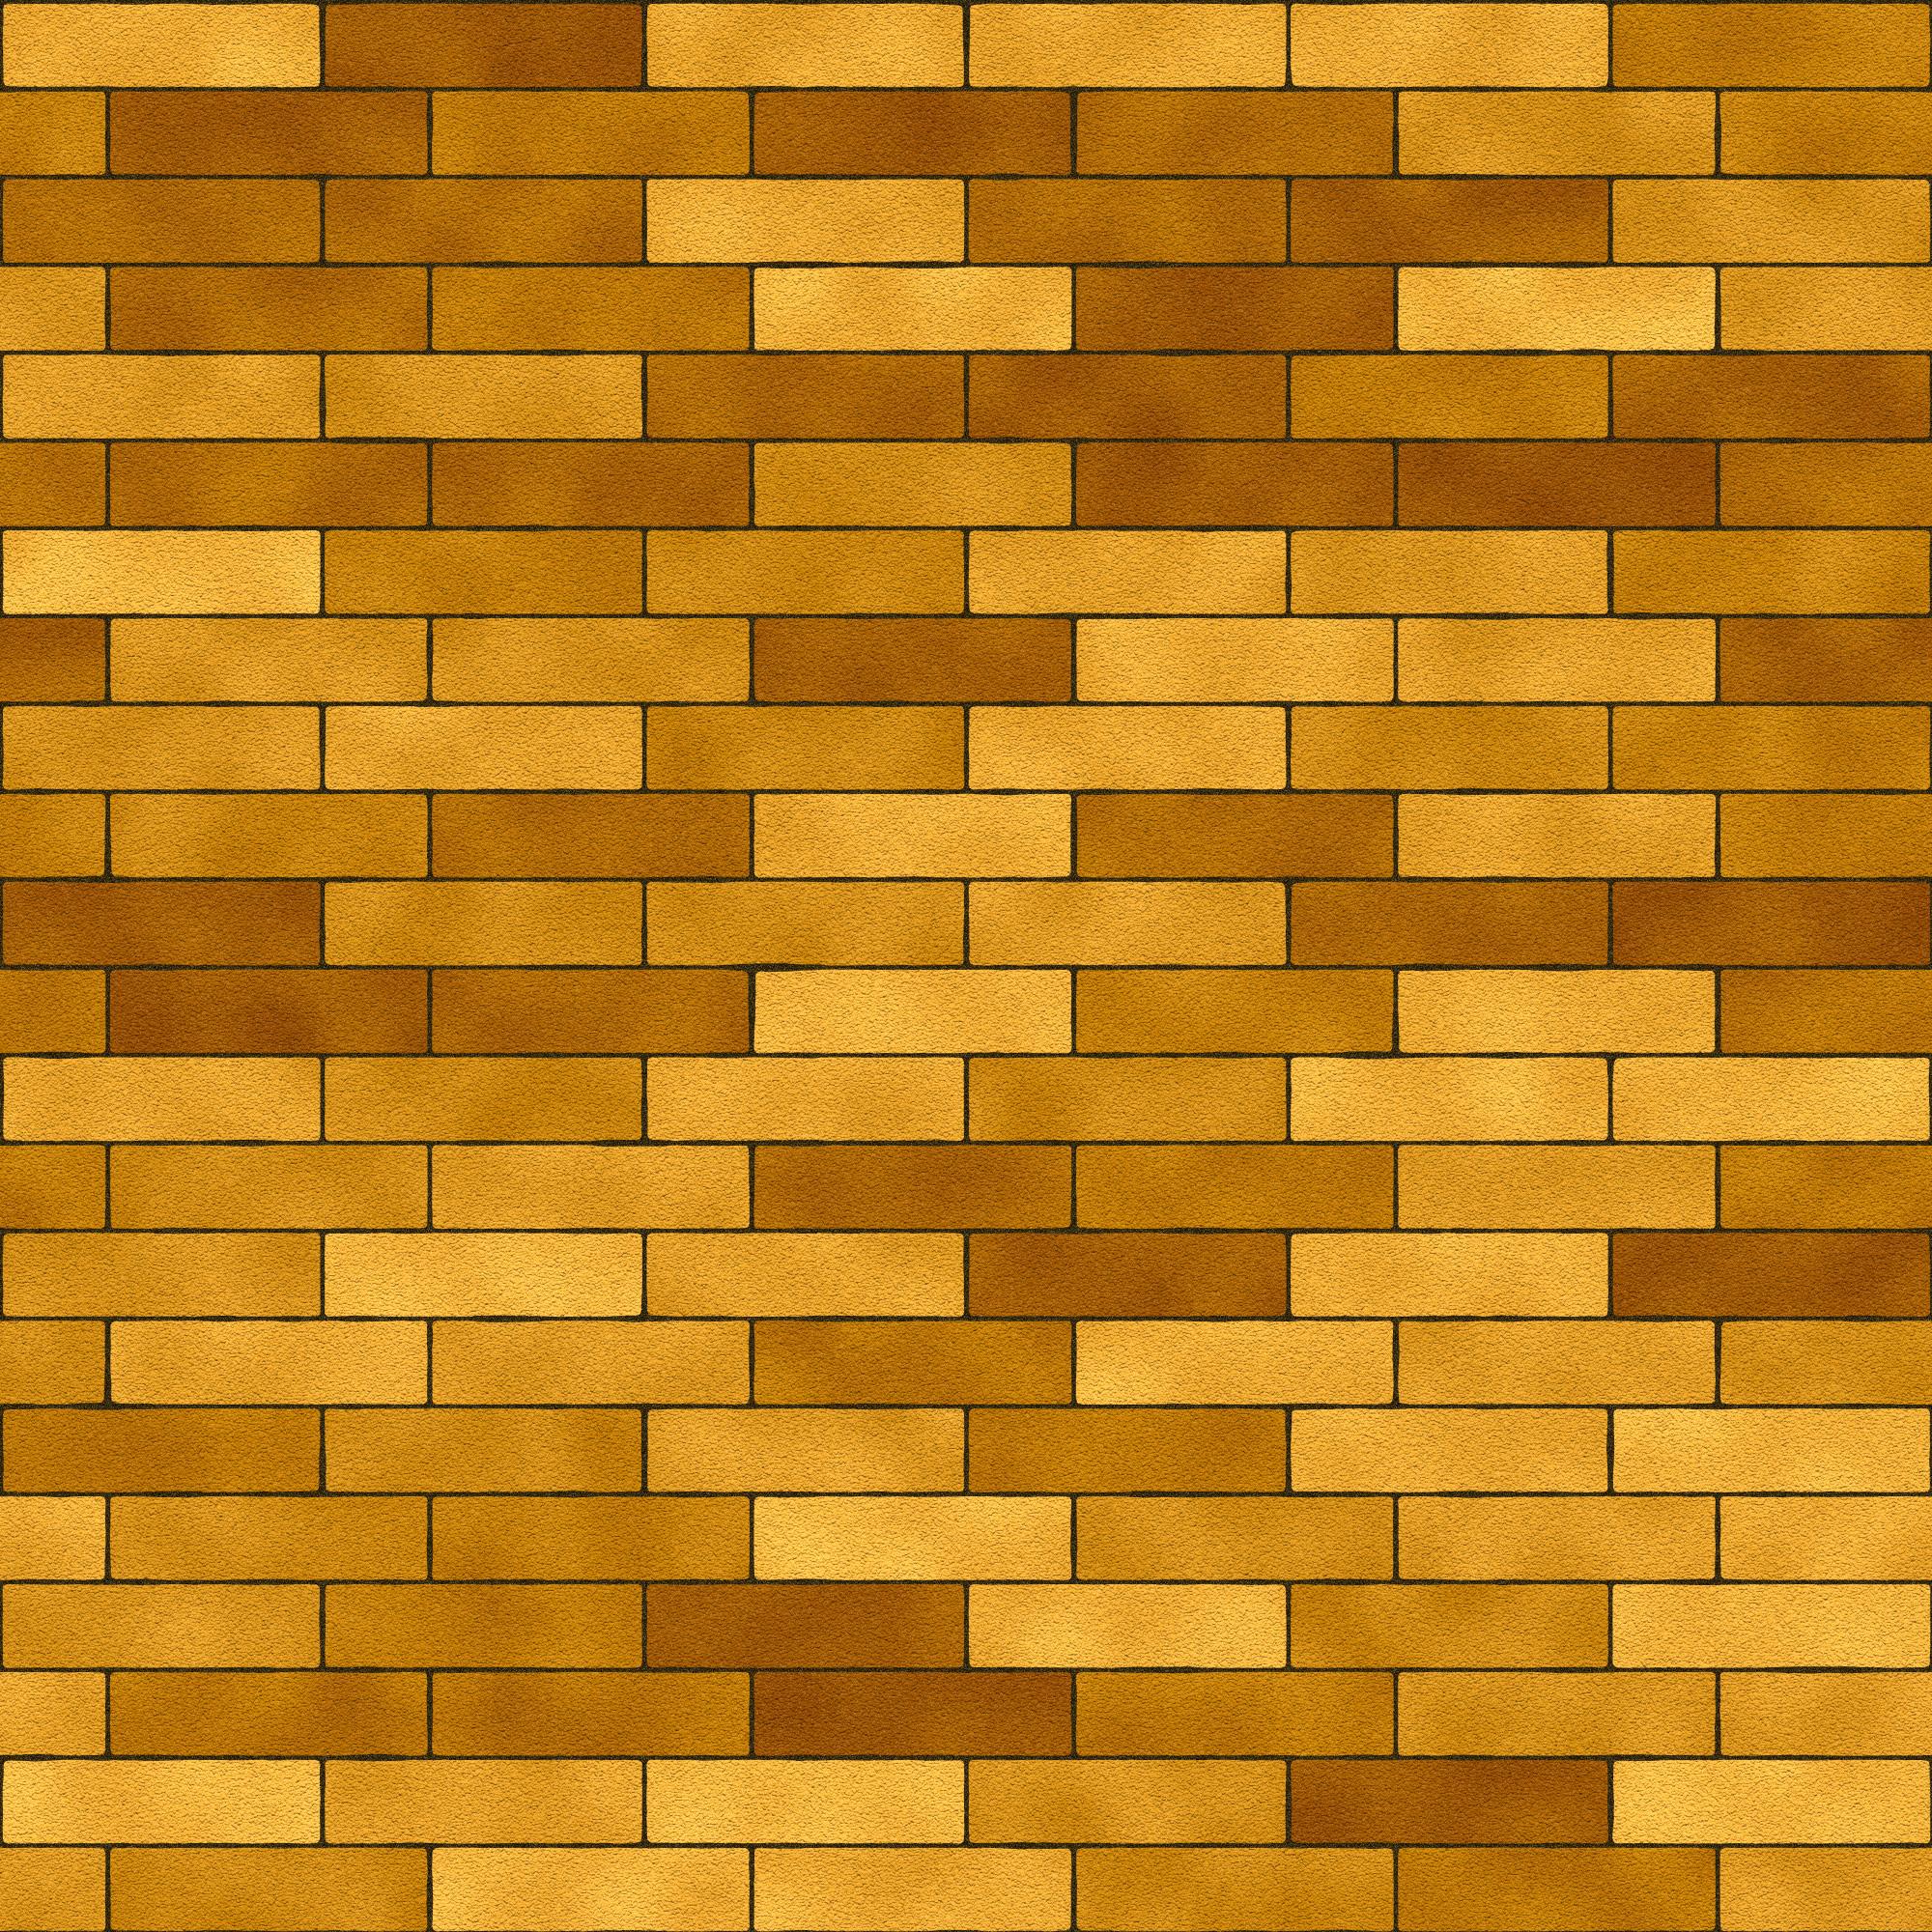 Fall Wood Wallpaper Free Photo Yellow Brick Wall Stones Stonewall Stained